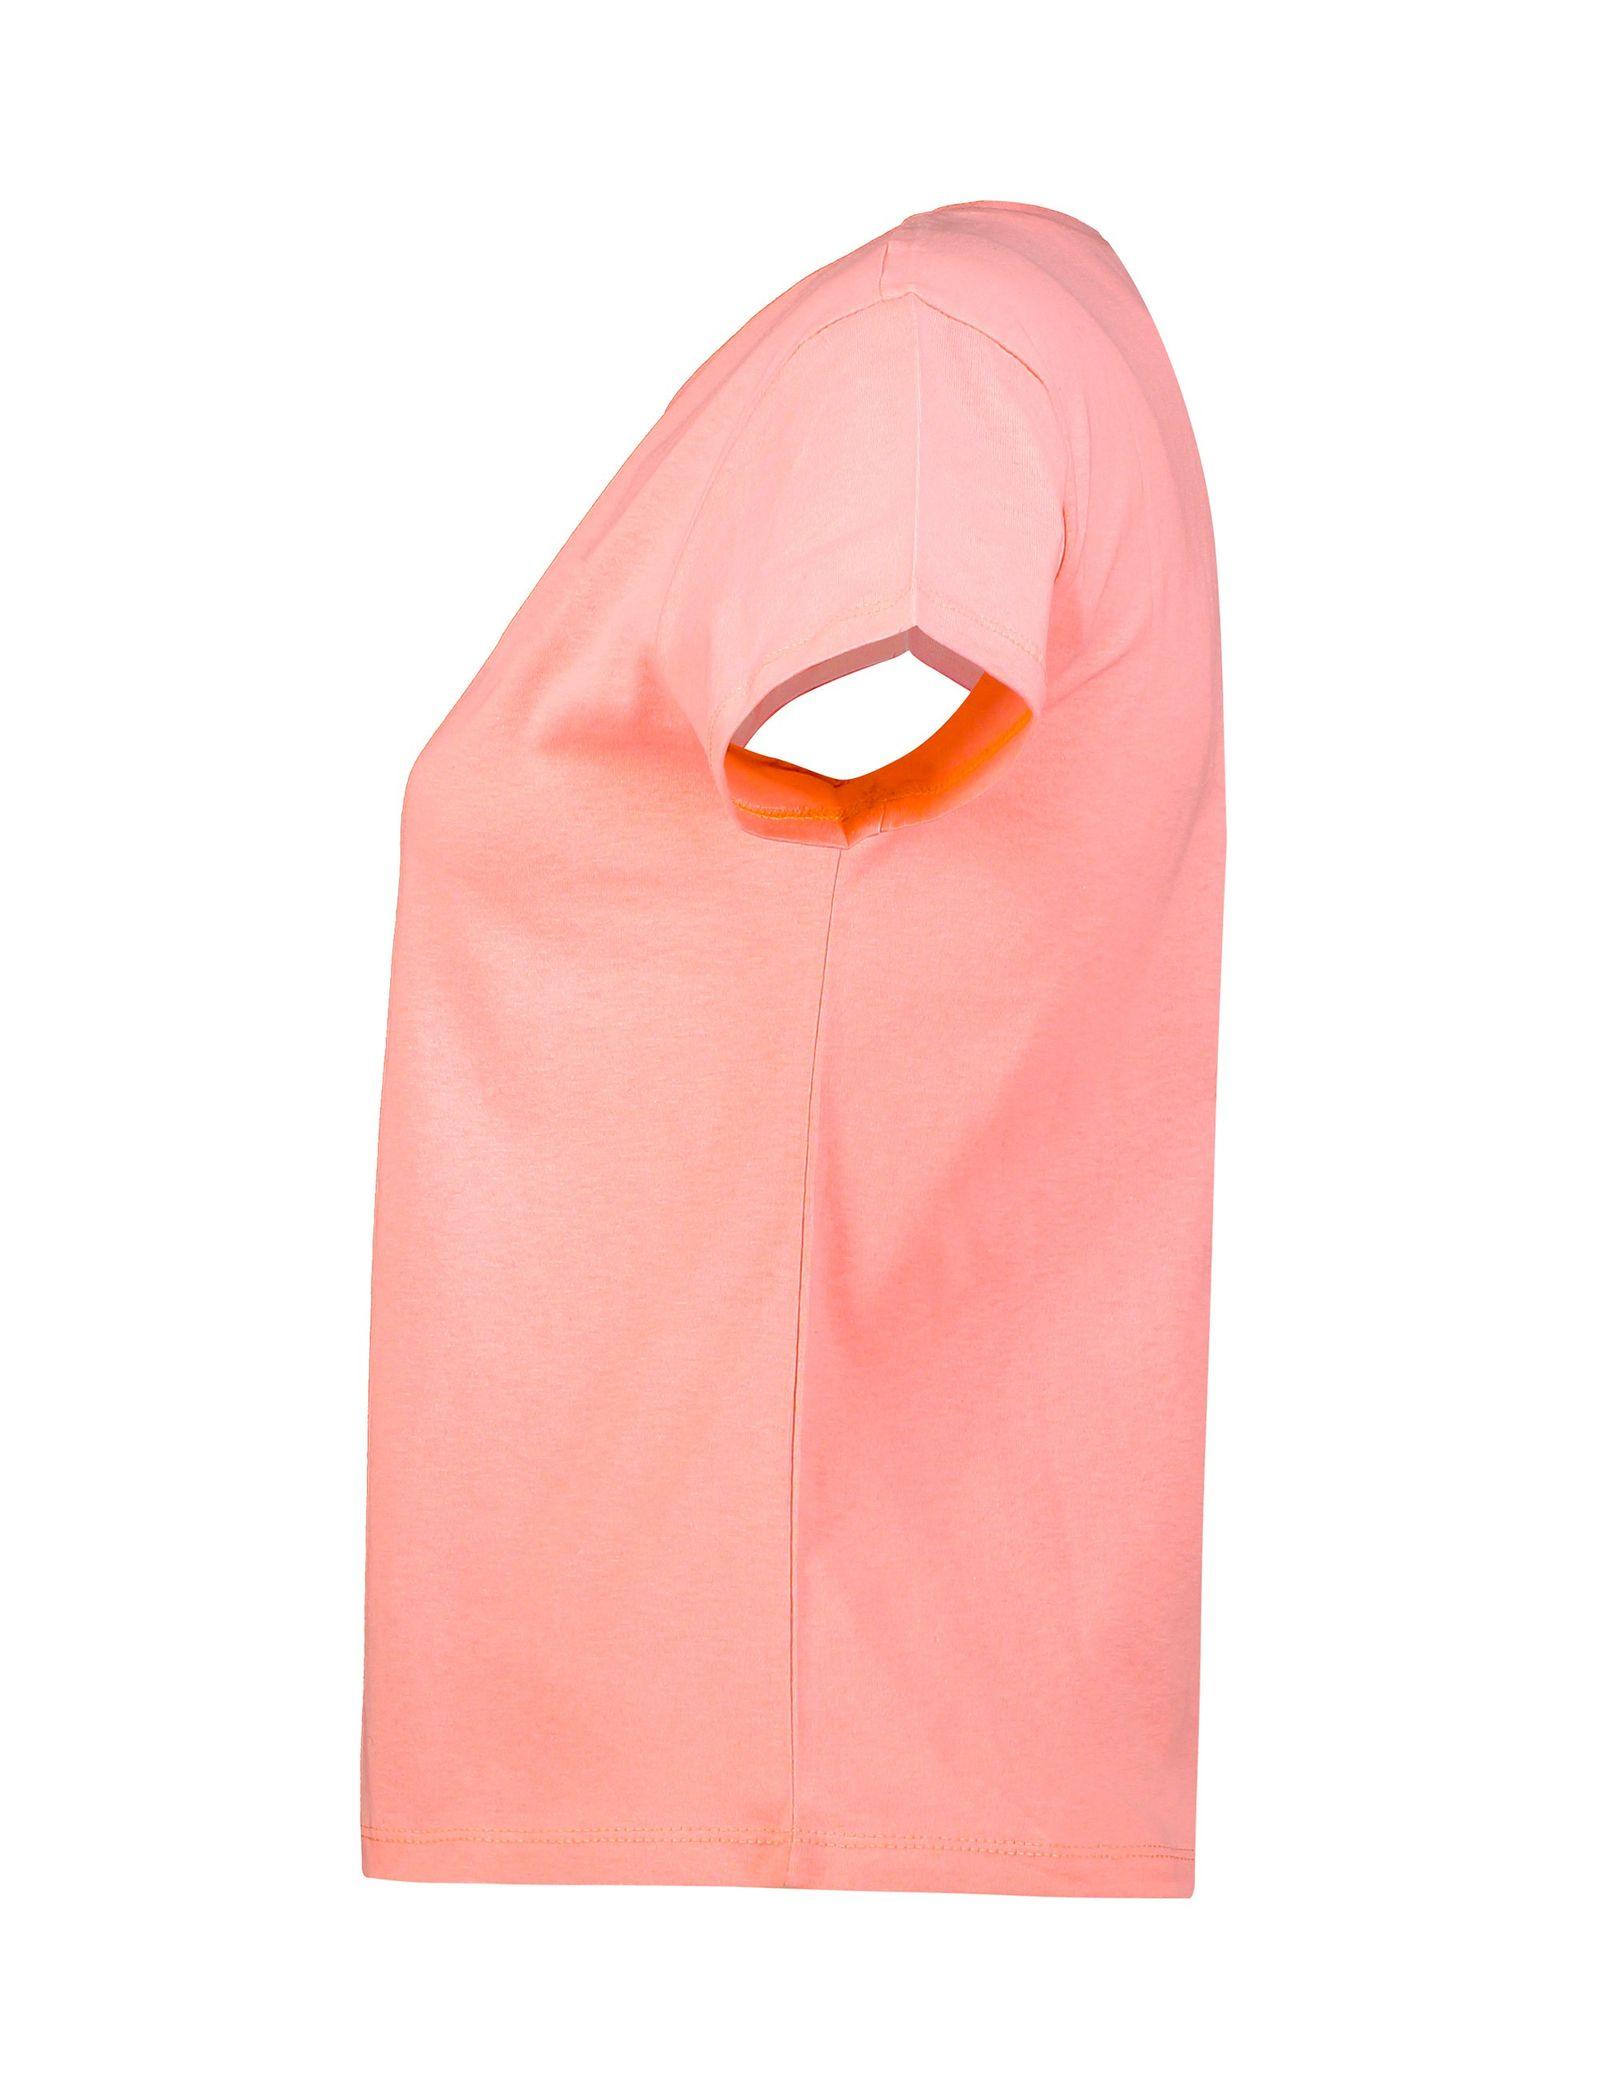 تی شرت نخی یقه گرد زنانه - کوتون - صورتي روشن - 3